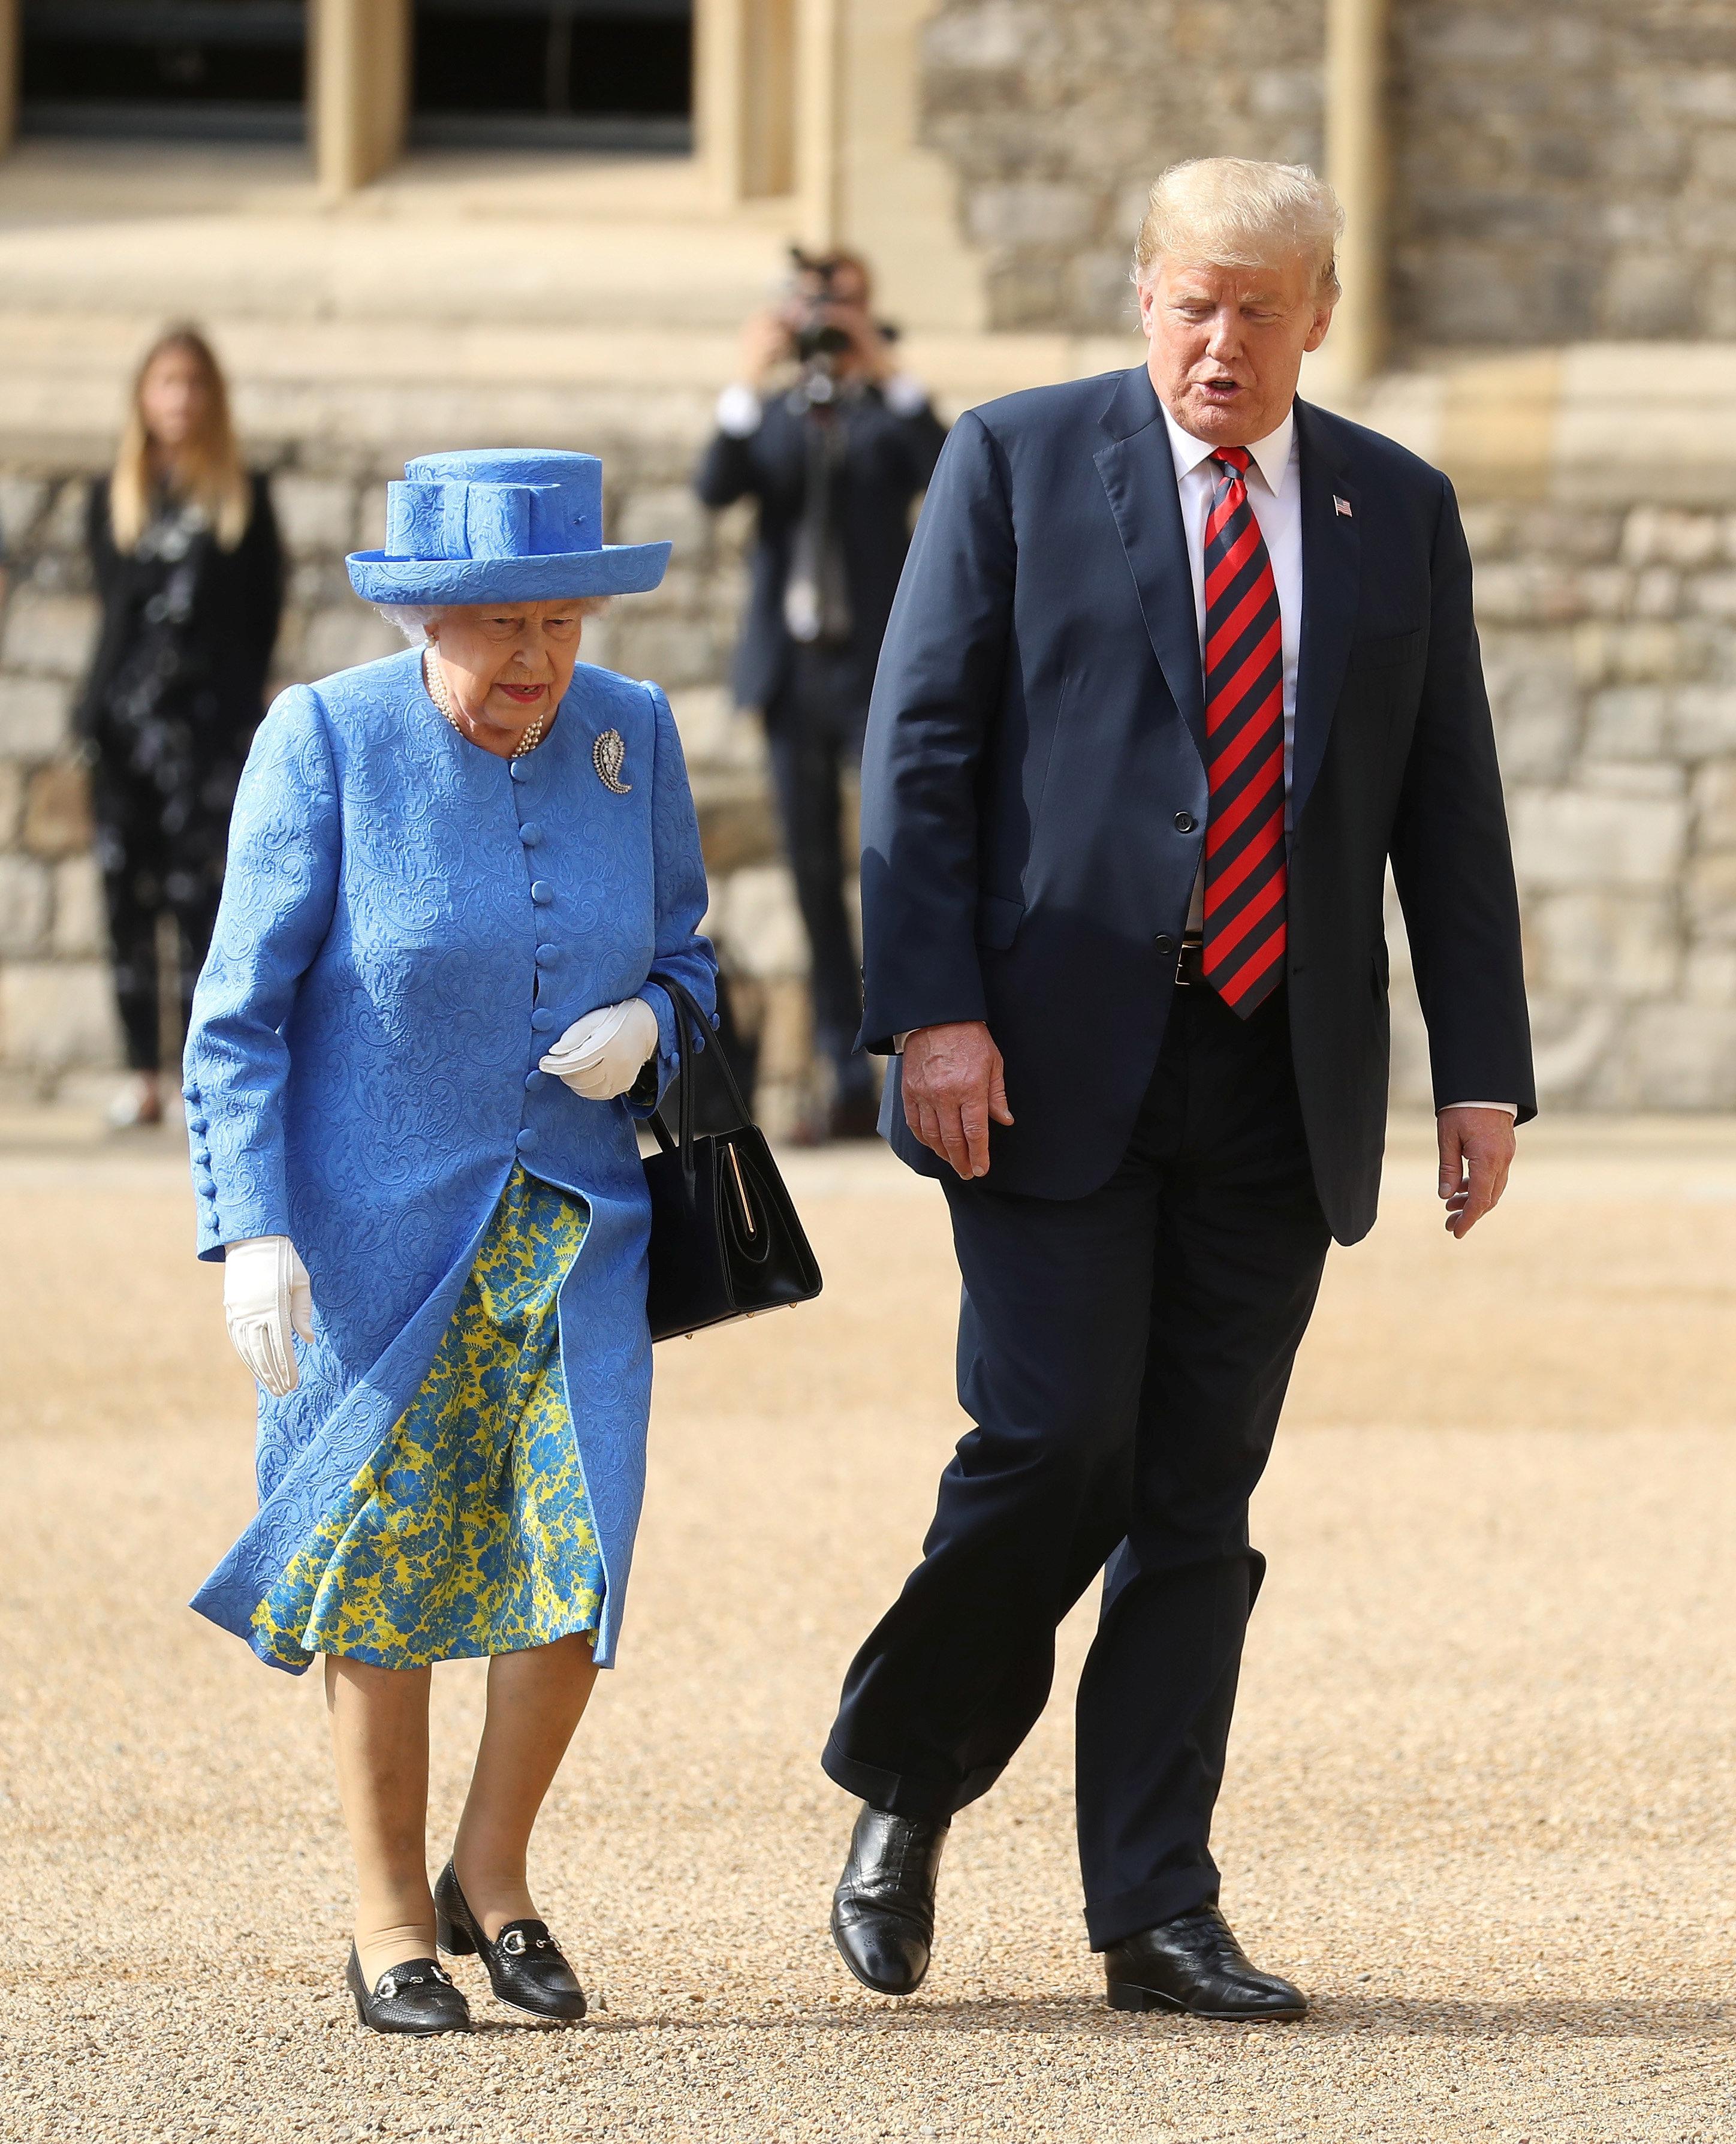 Britain's Queen Elizabeth inspects an honour guard with U.S. President Donald Trump at Windsor Castle, Windsor, Britain July 13, 2018.  Chris Jackson/Pool via REUTERS